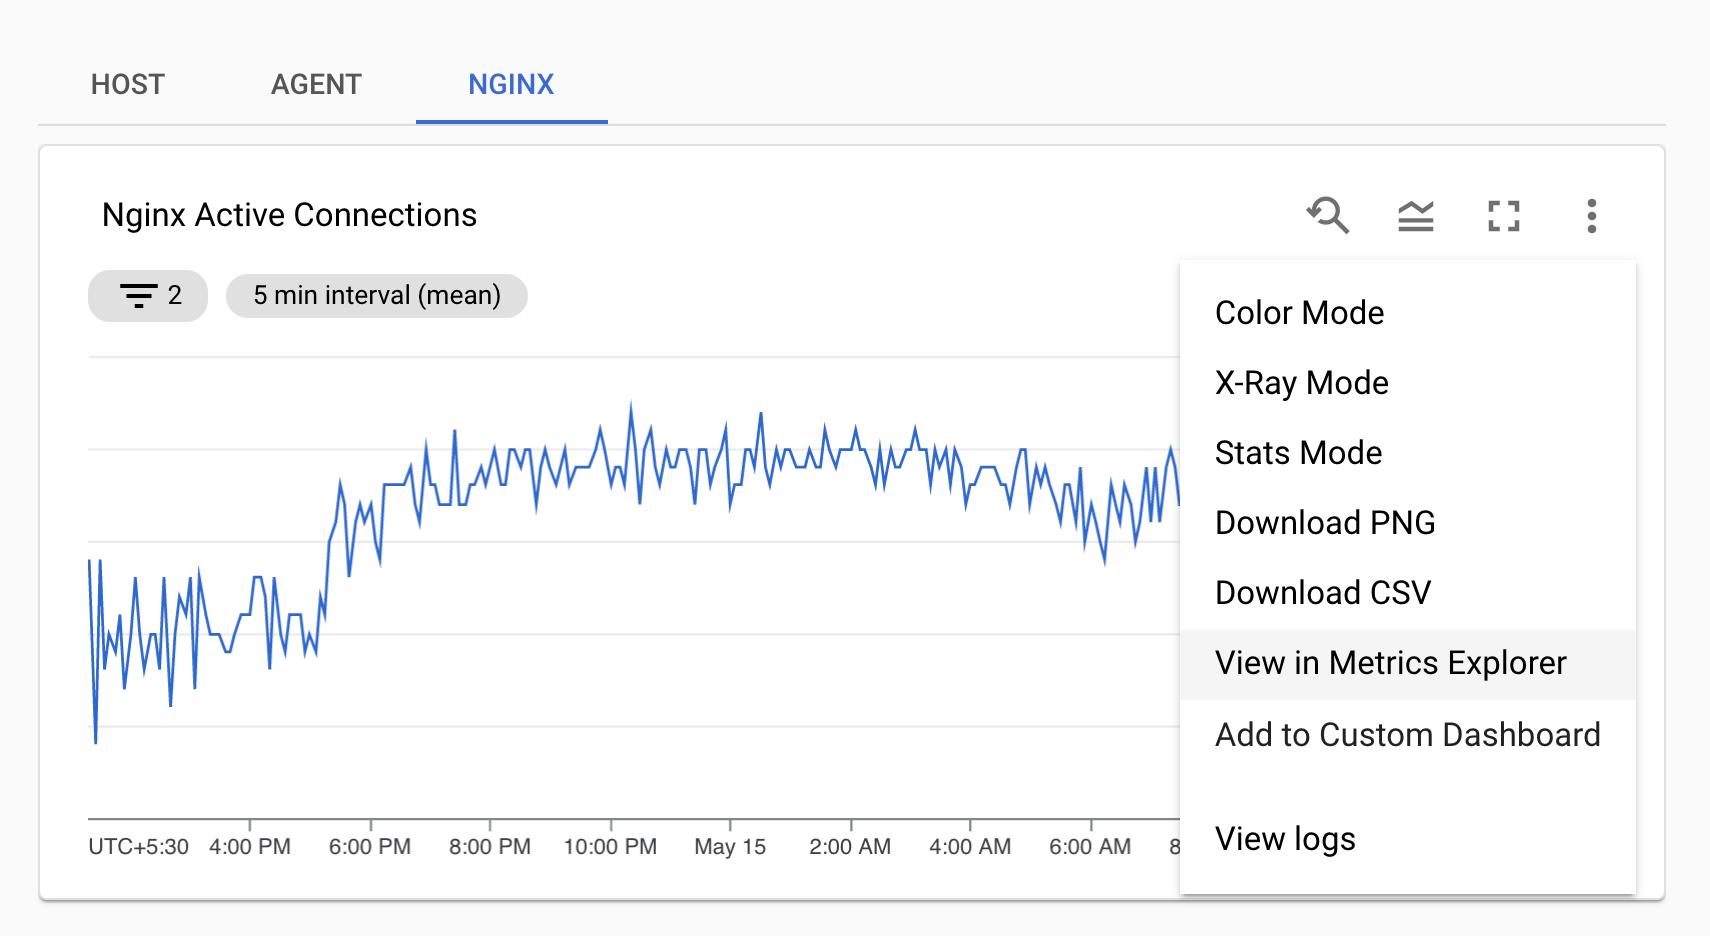 Google Cloud Monitoring - Charts View in Metrics Explorer